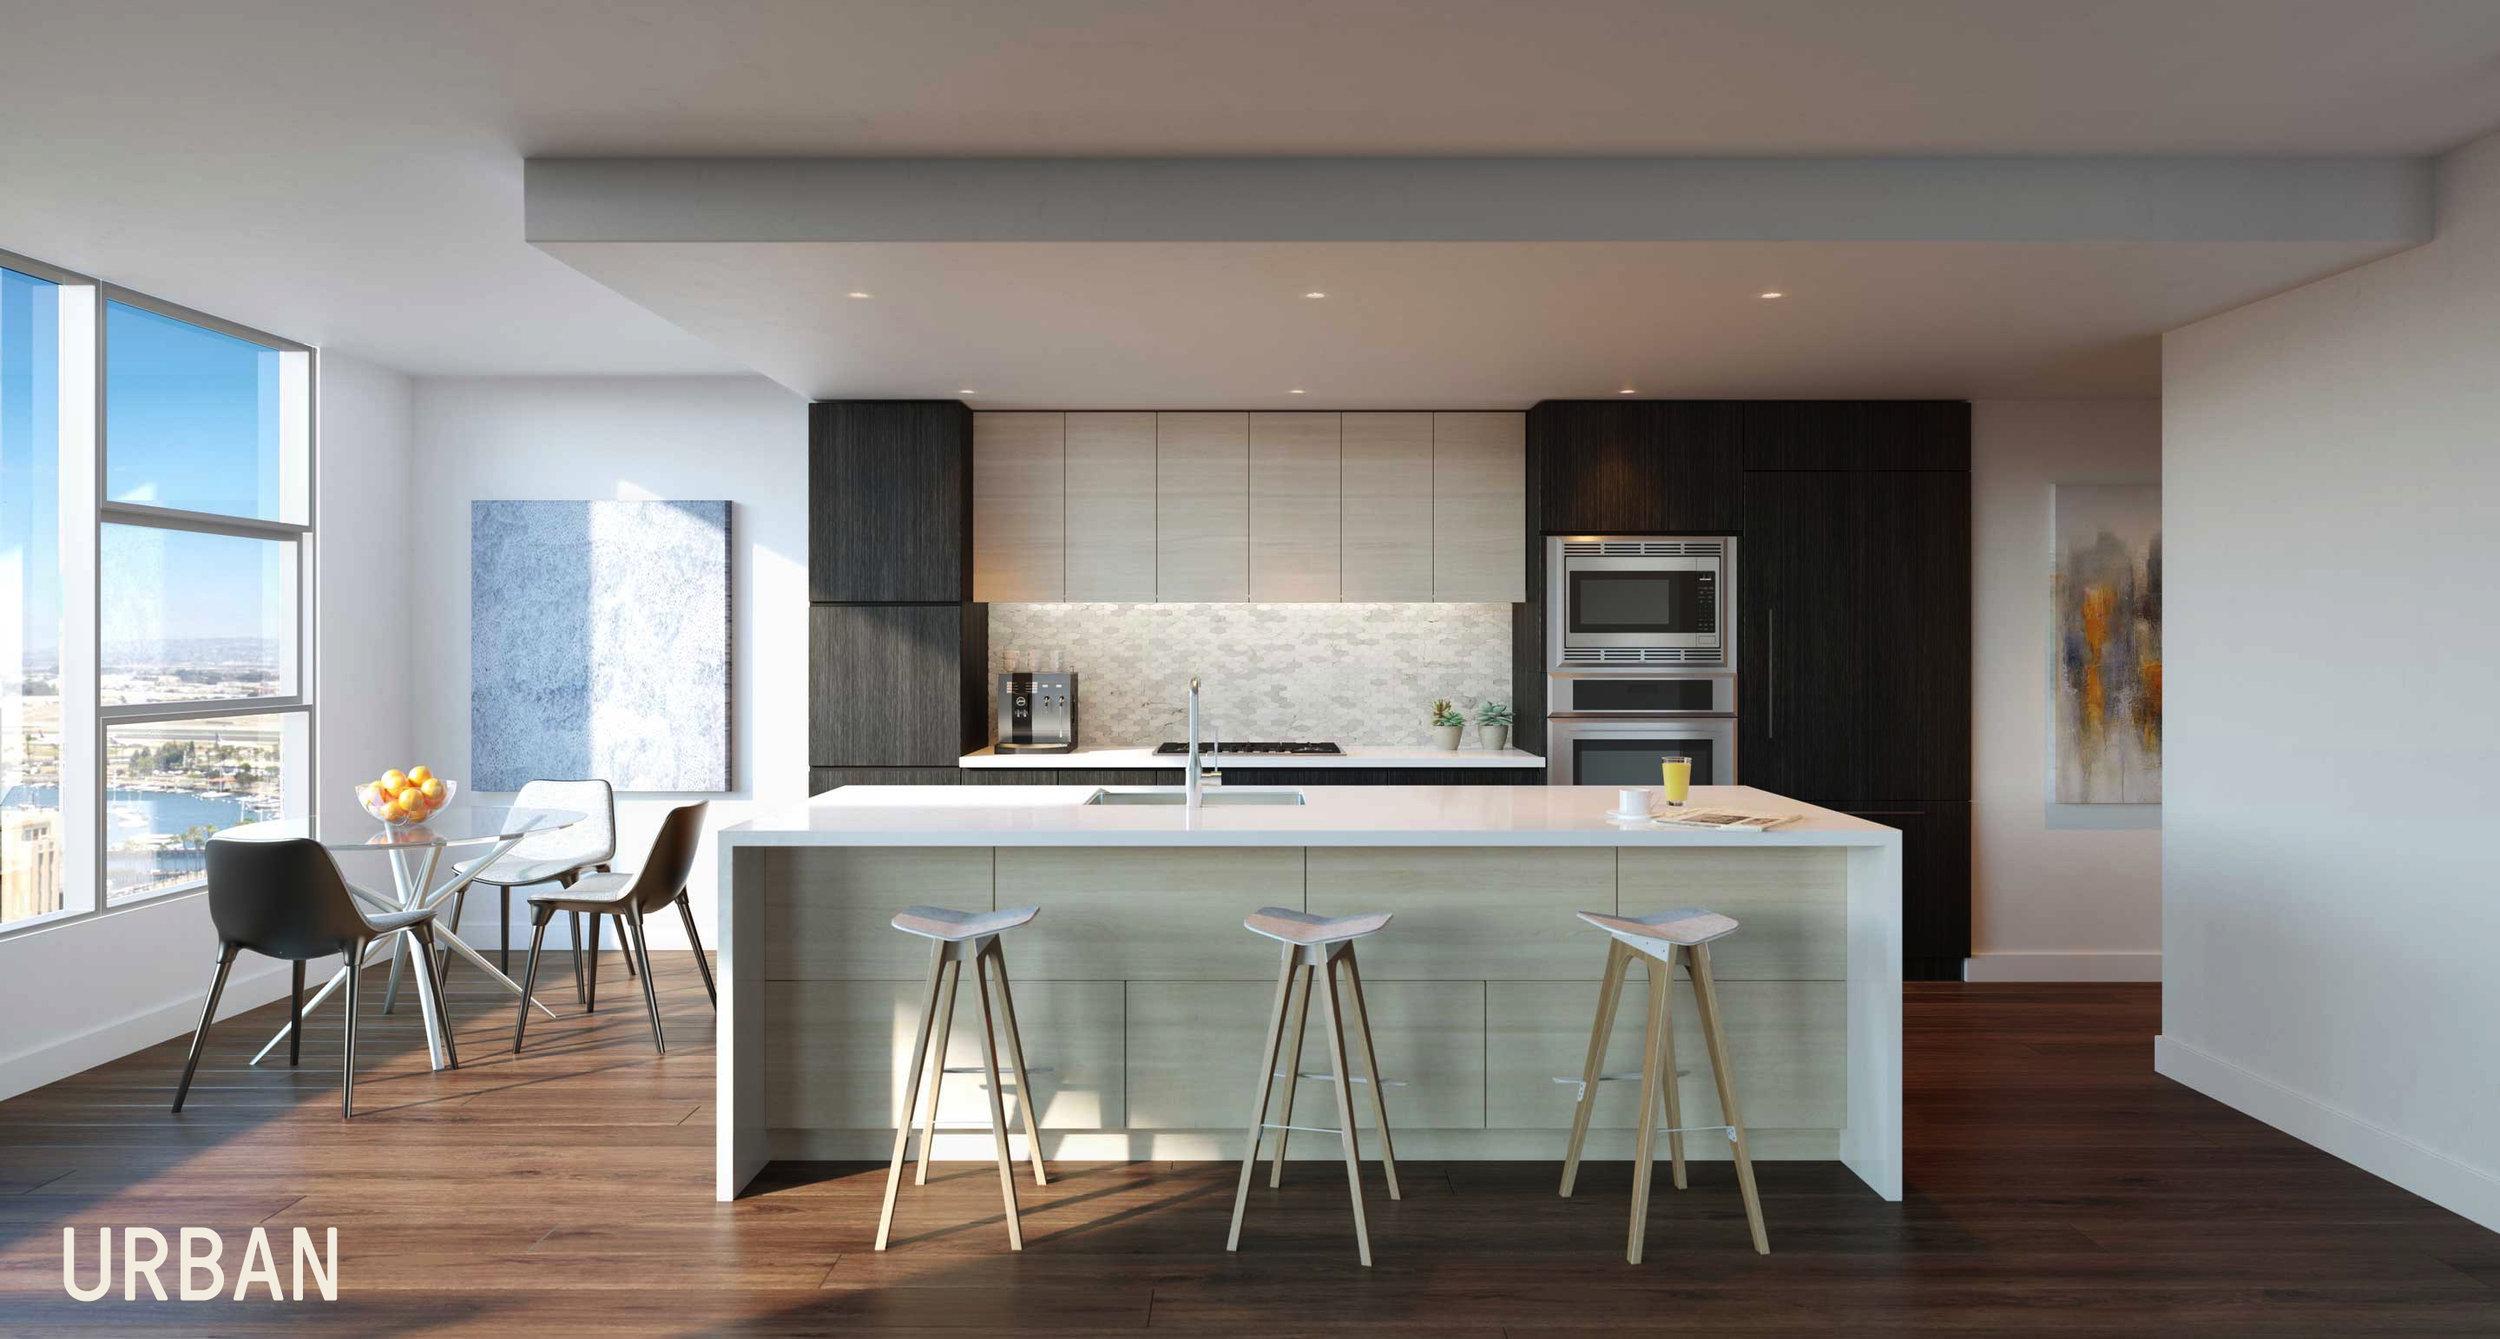 savina_kitchen_urban.jpg